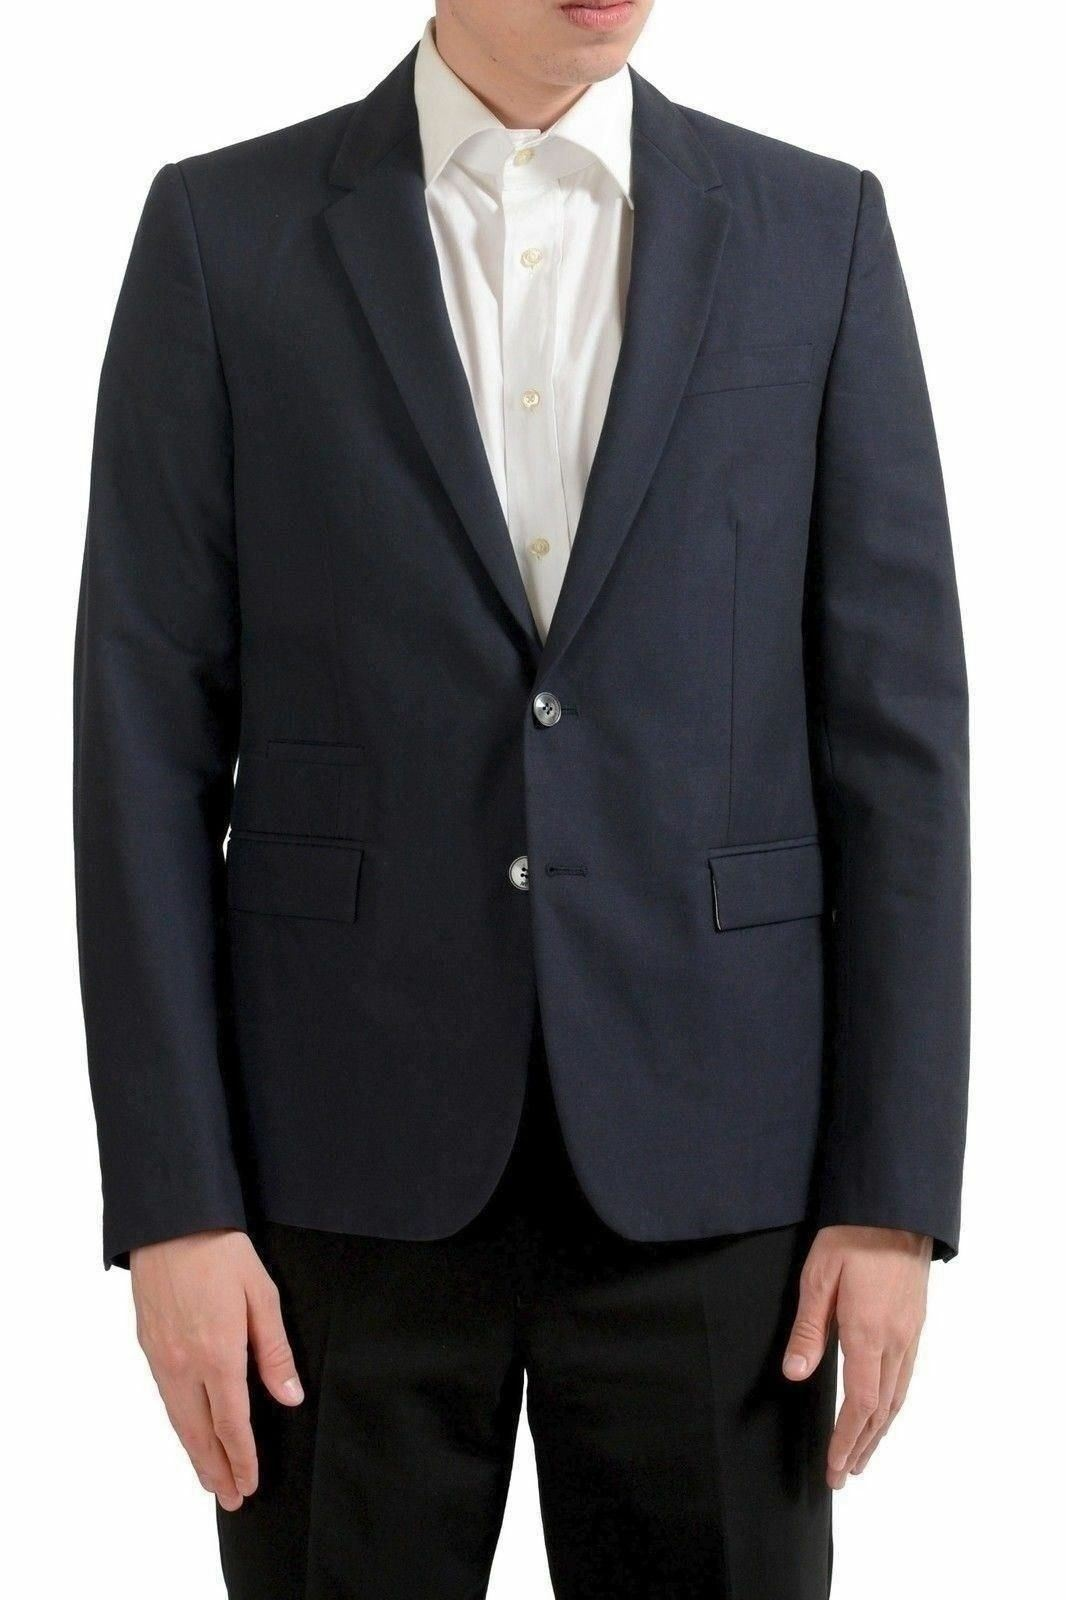 Just Cavalli Men's Wool Navy bluee Two Button Blazer Sport Coat US 38 IT 48